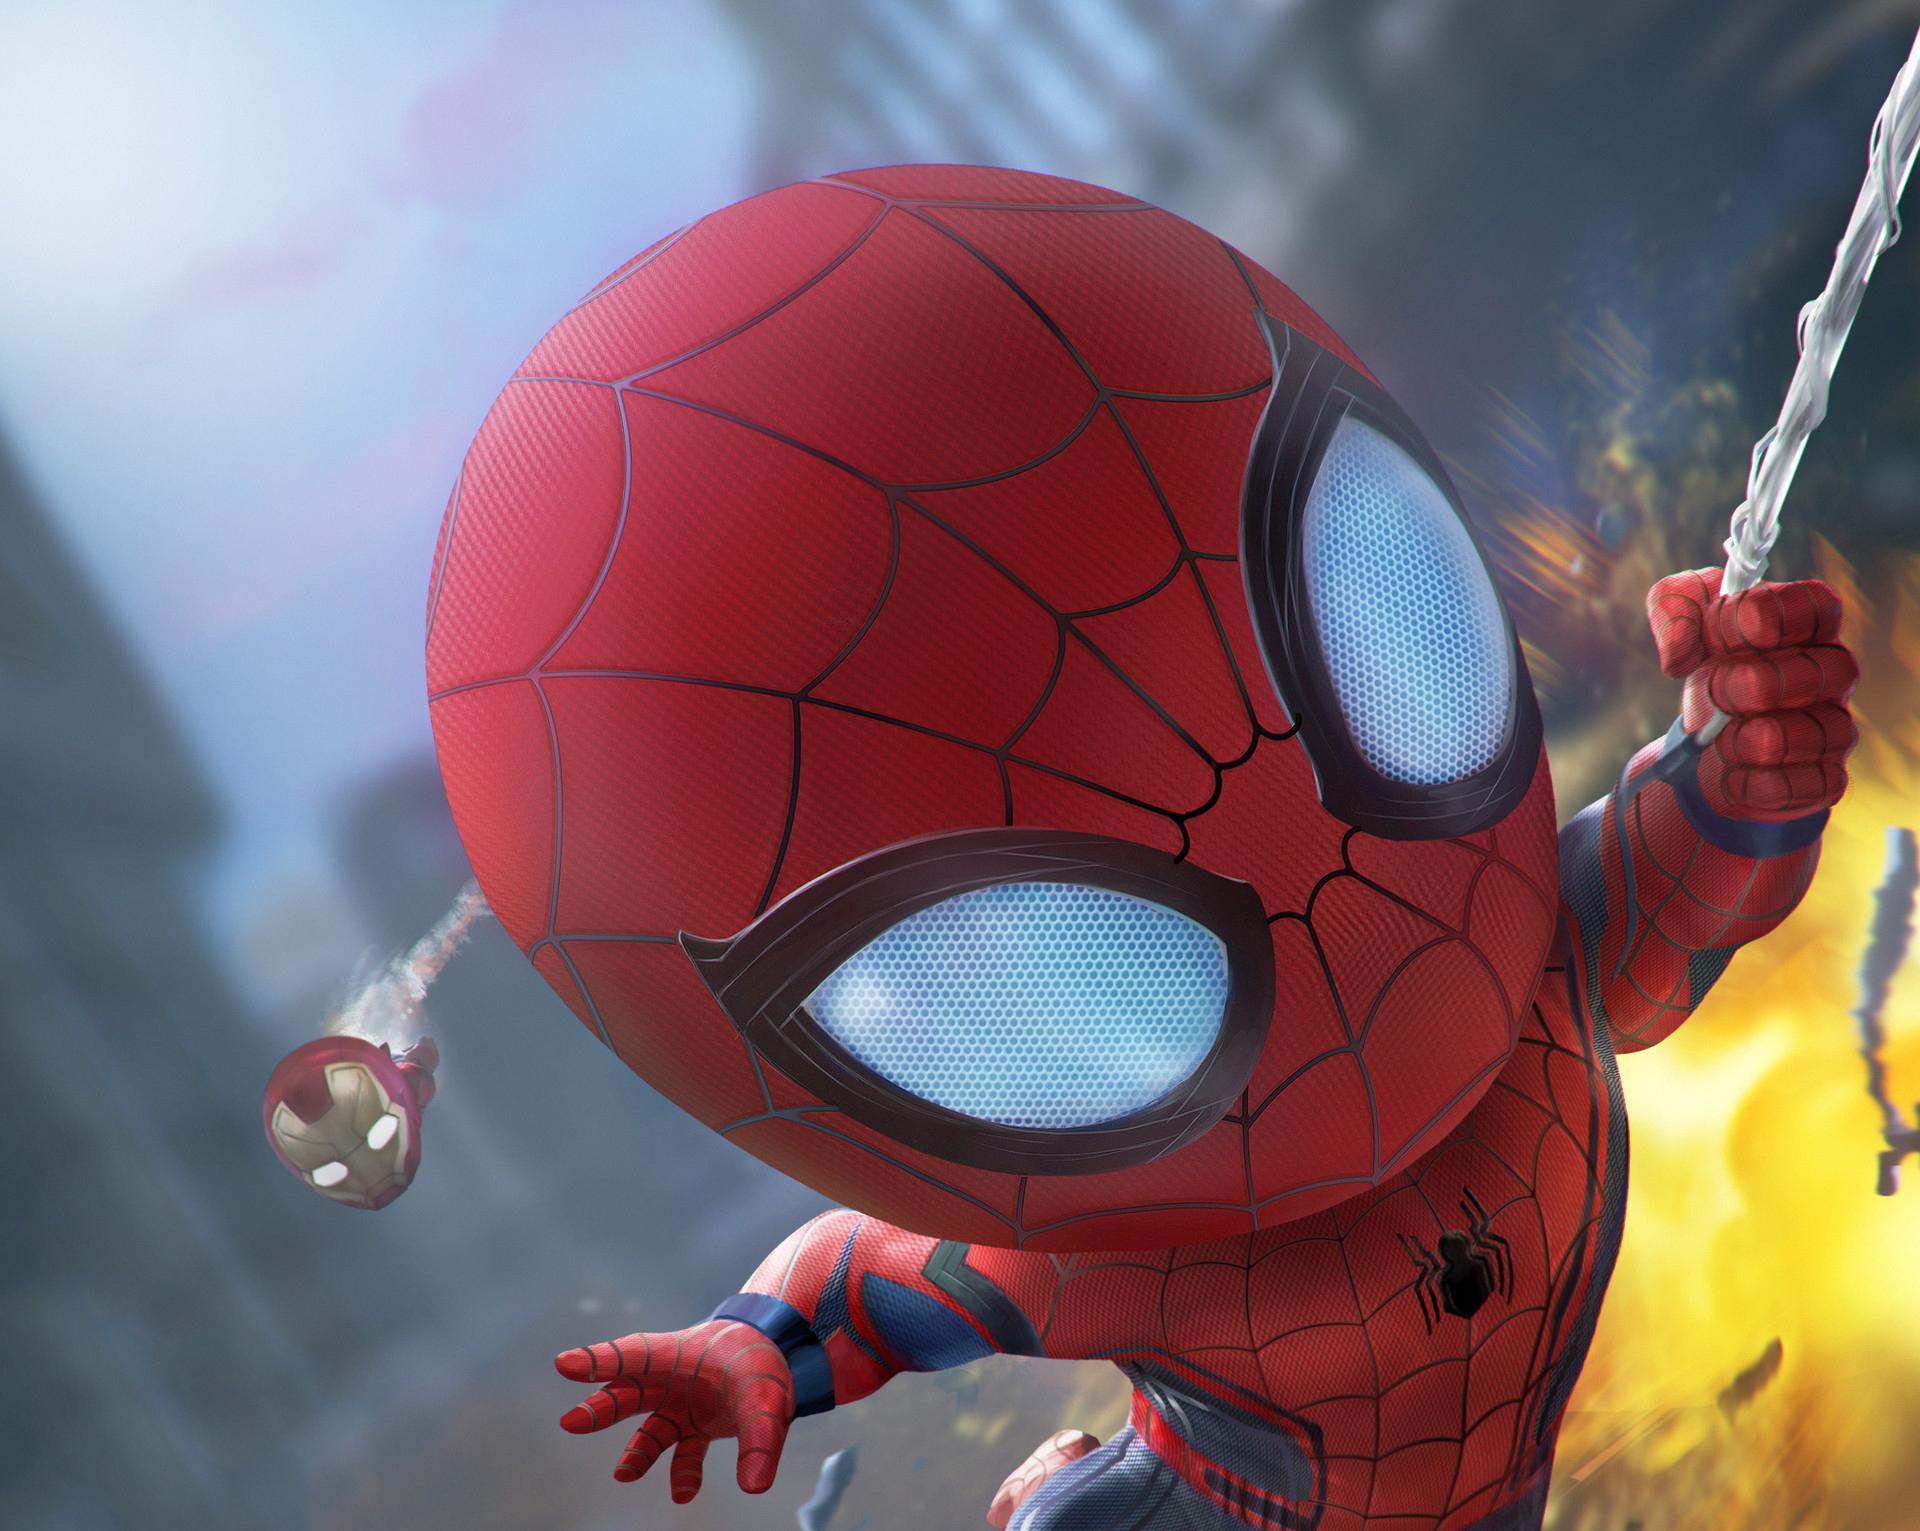 Spiderman And Iron Man Artwork HD